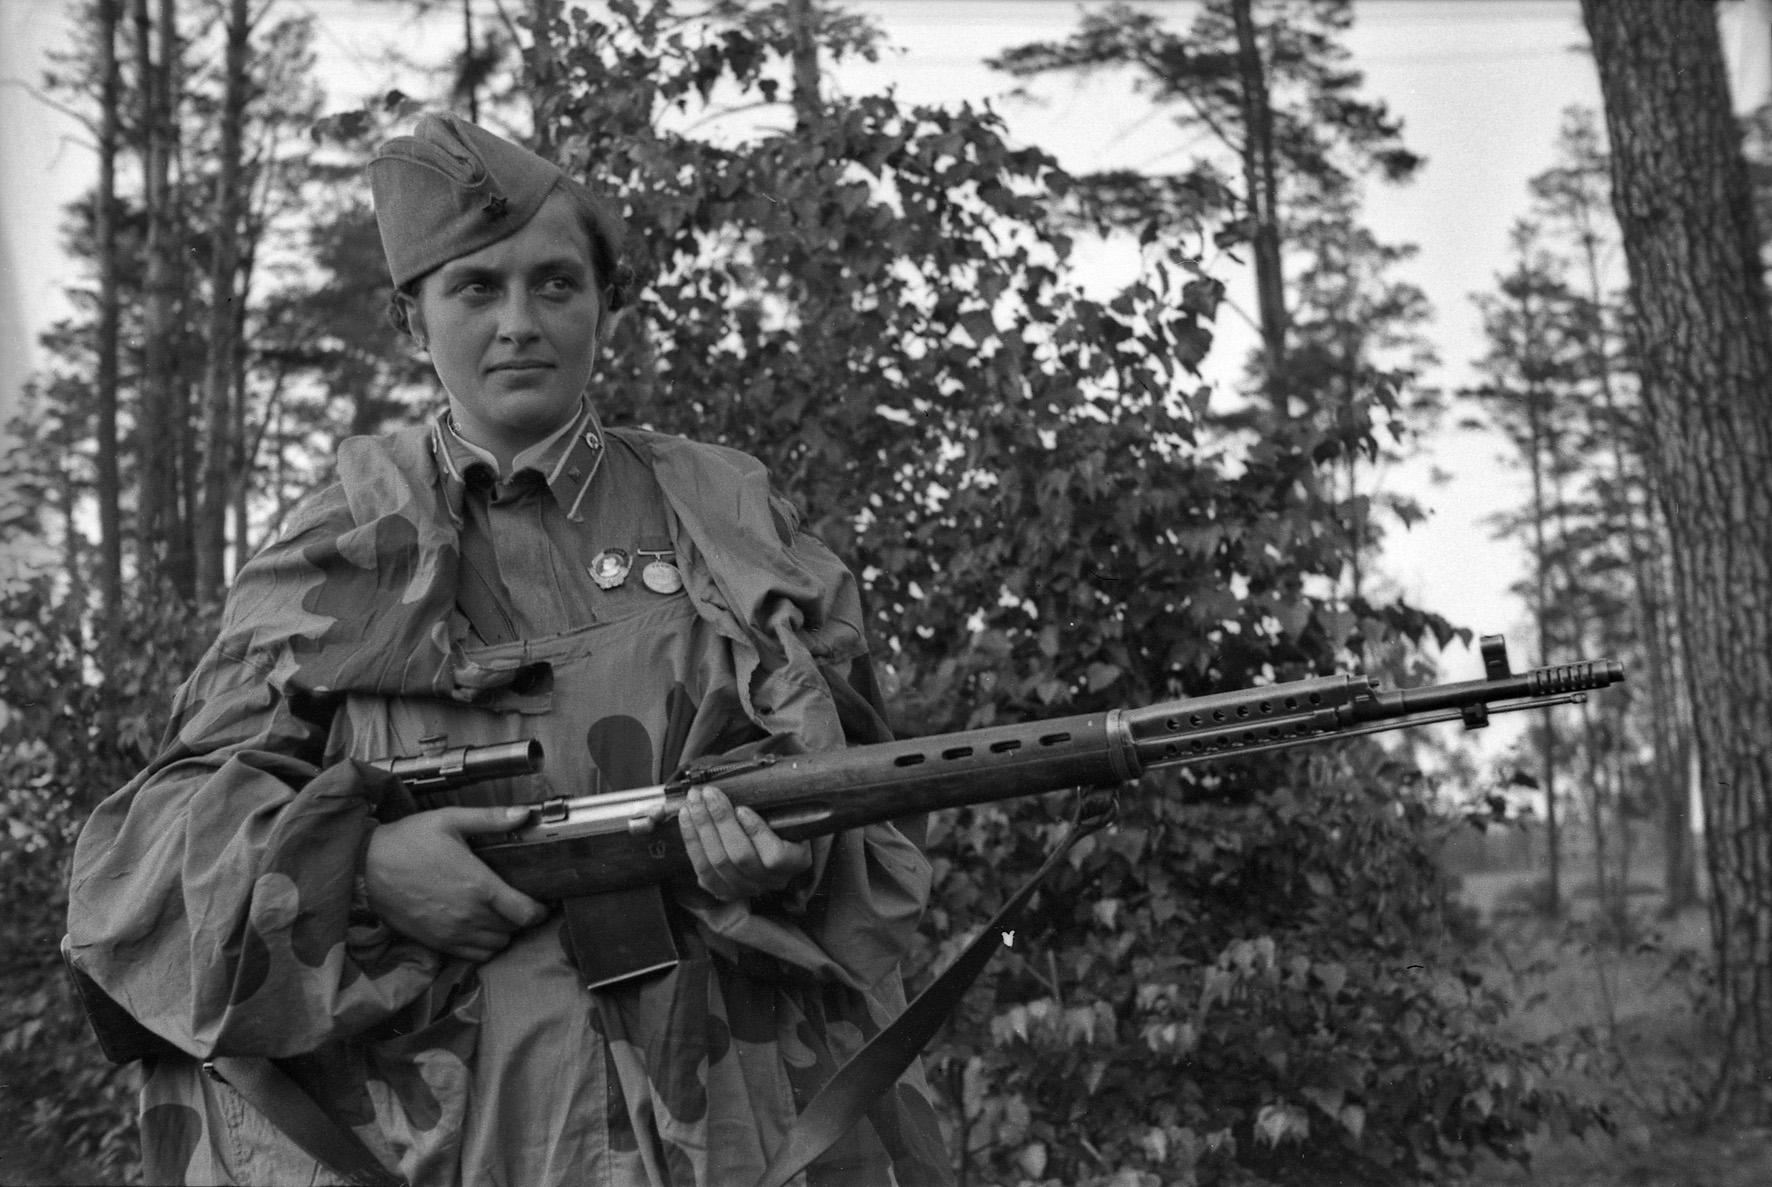 павличенко снайпер